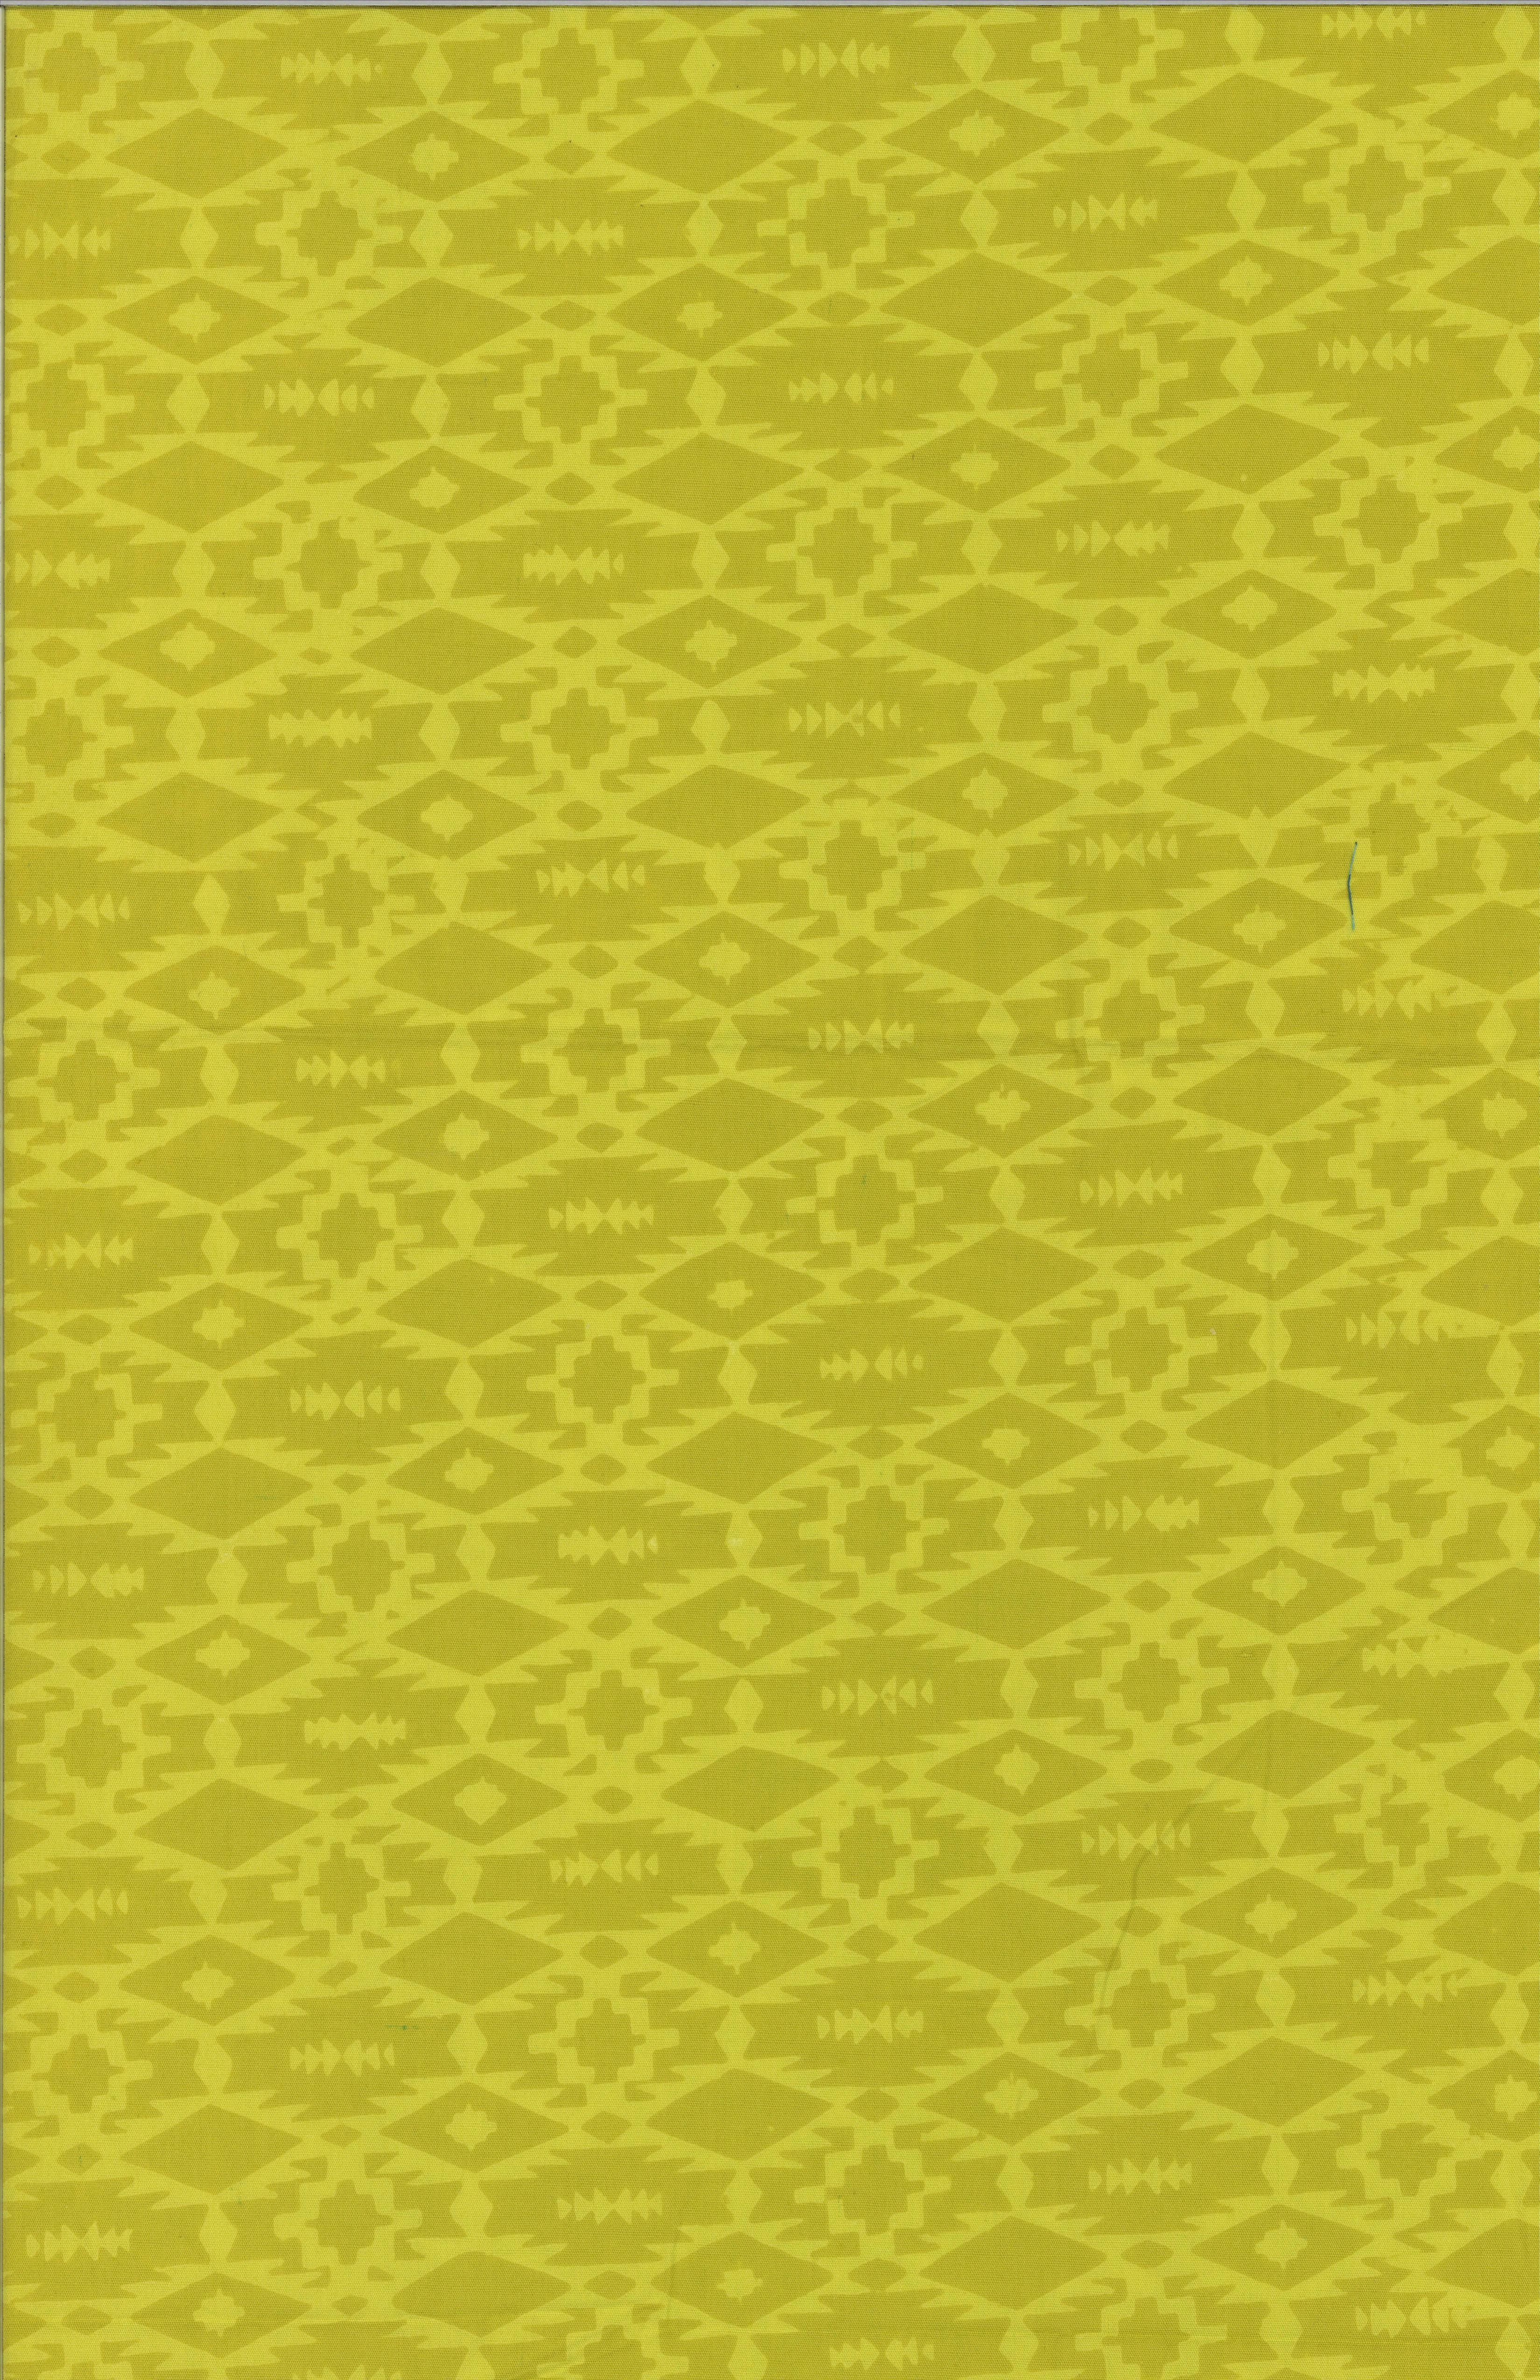 121_496_Pineapple